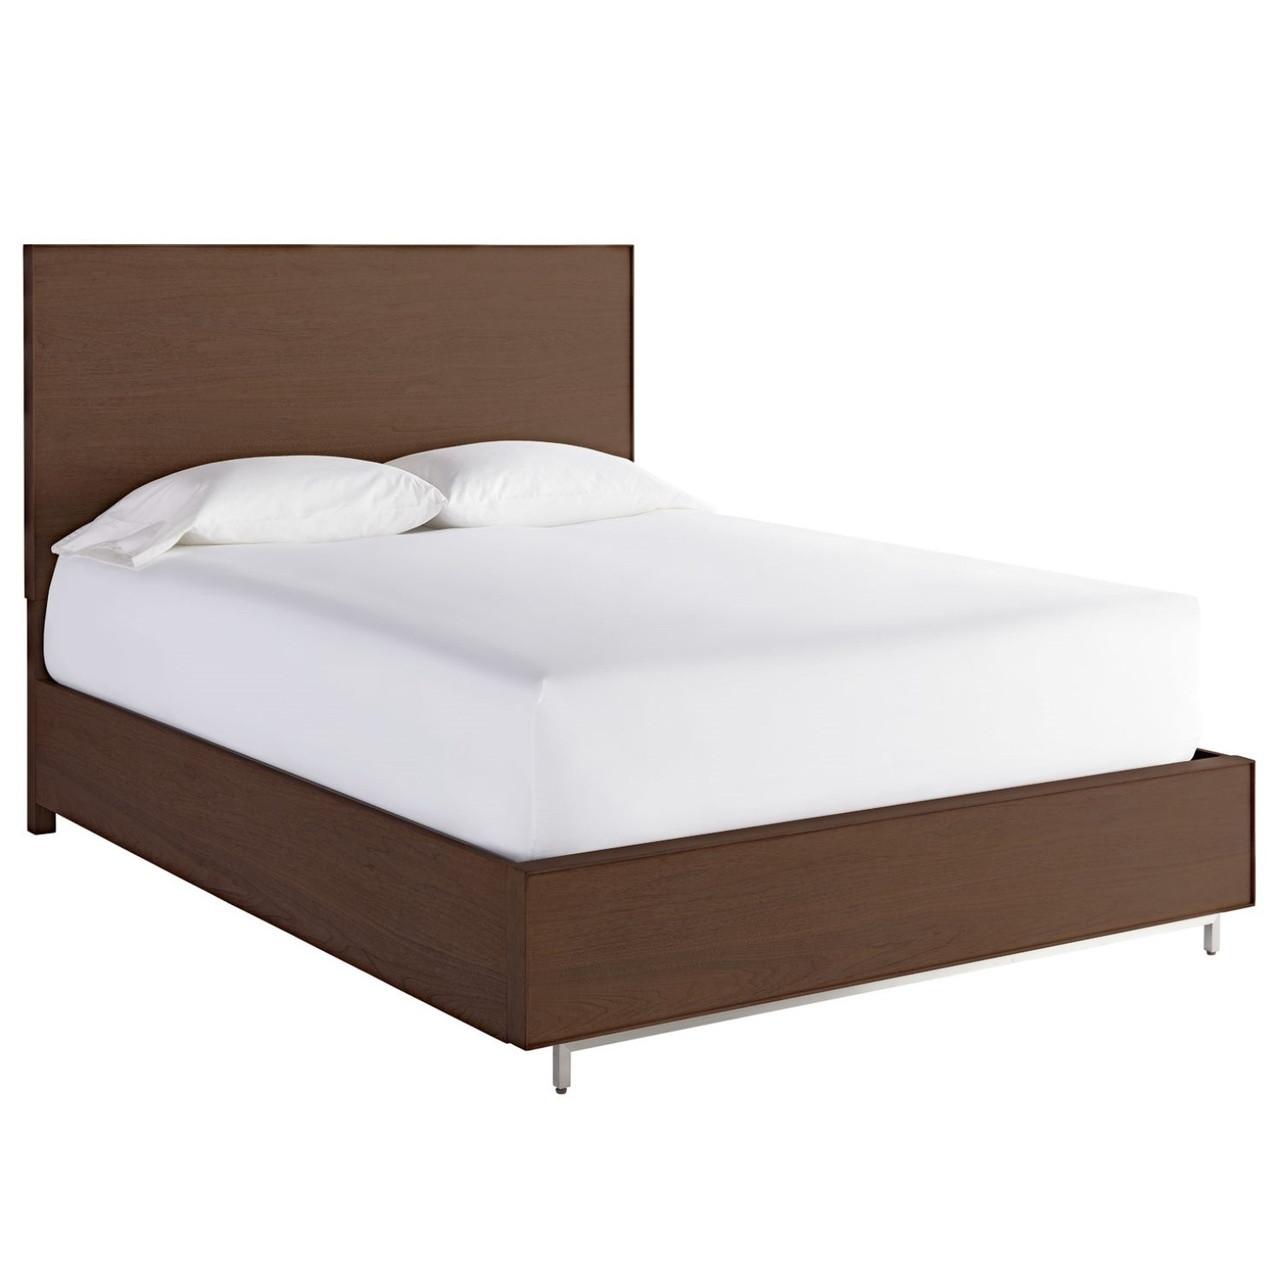 king storage bed modern urban modern walnut king platform storage bed frame zin home